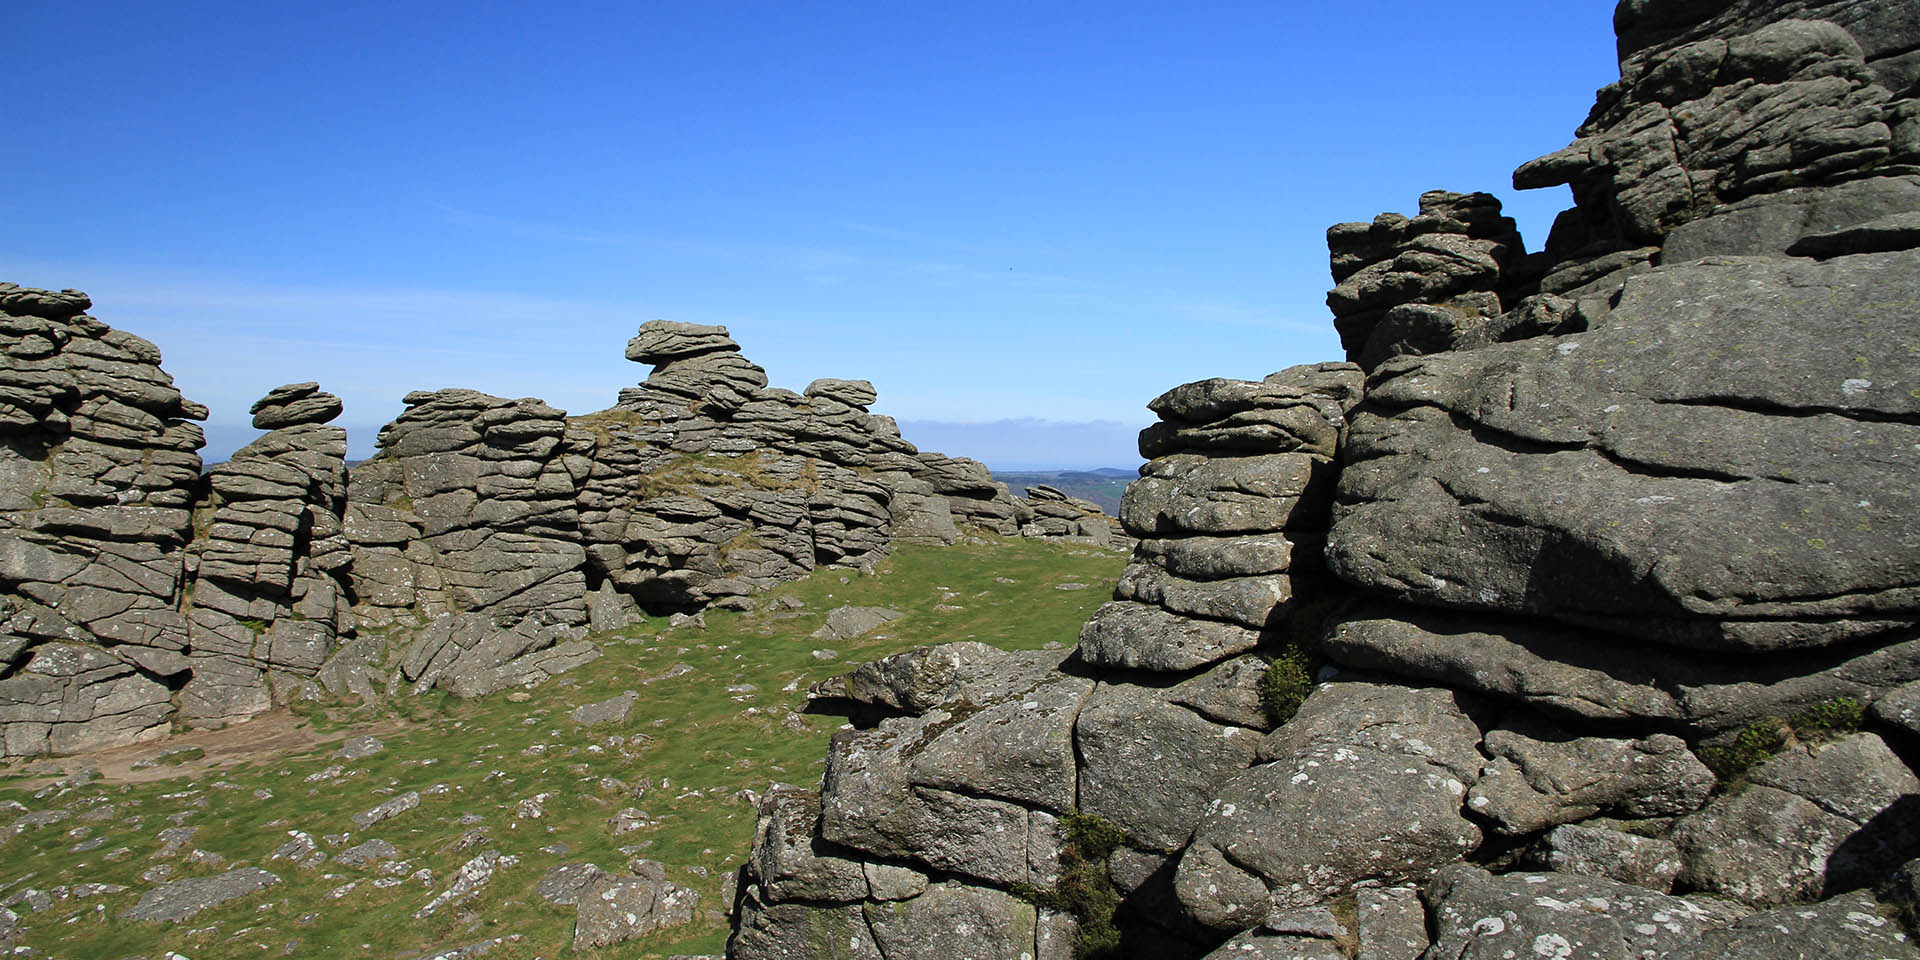 Hound Tor rocks